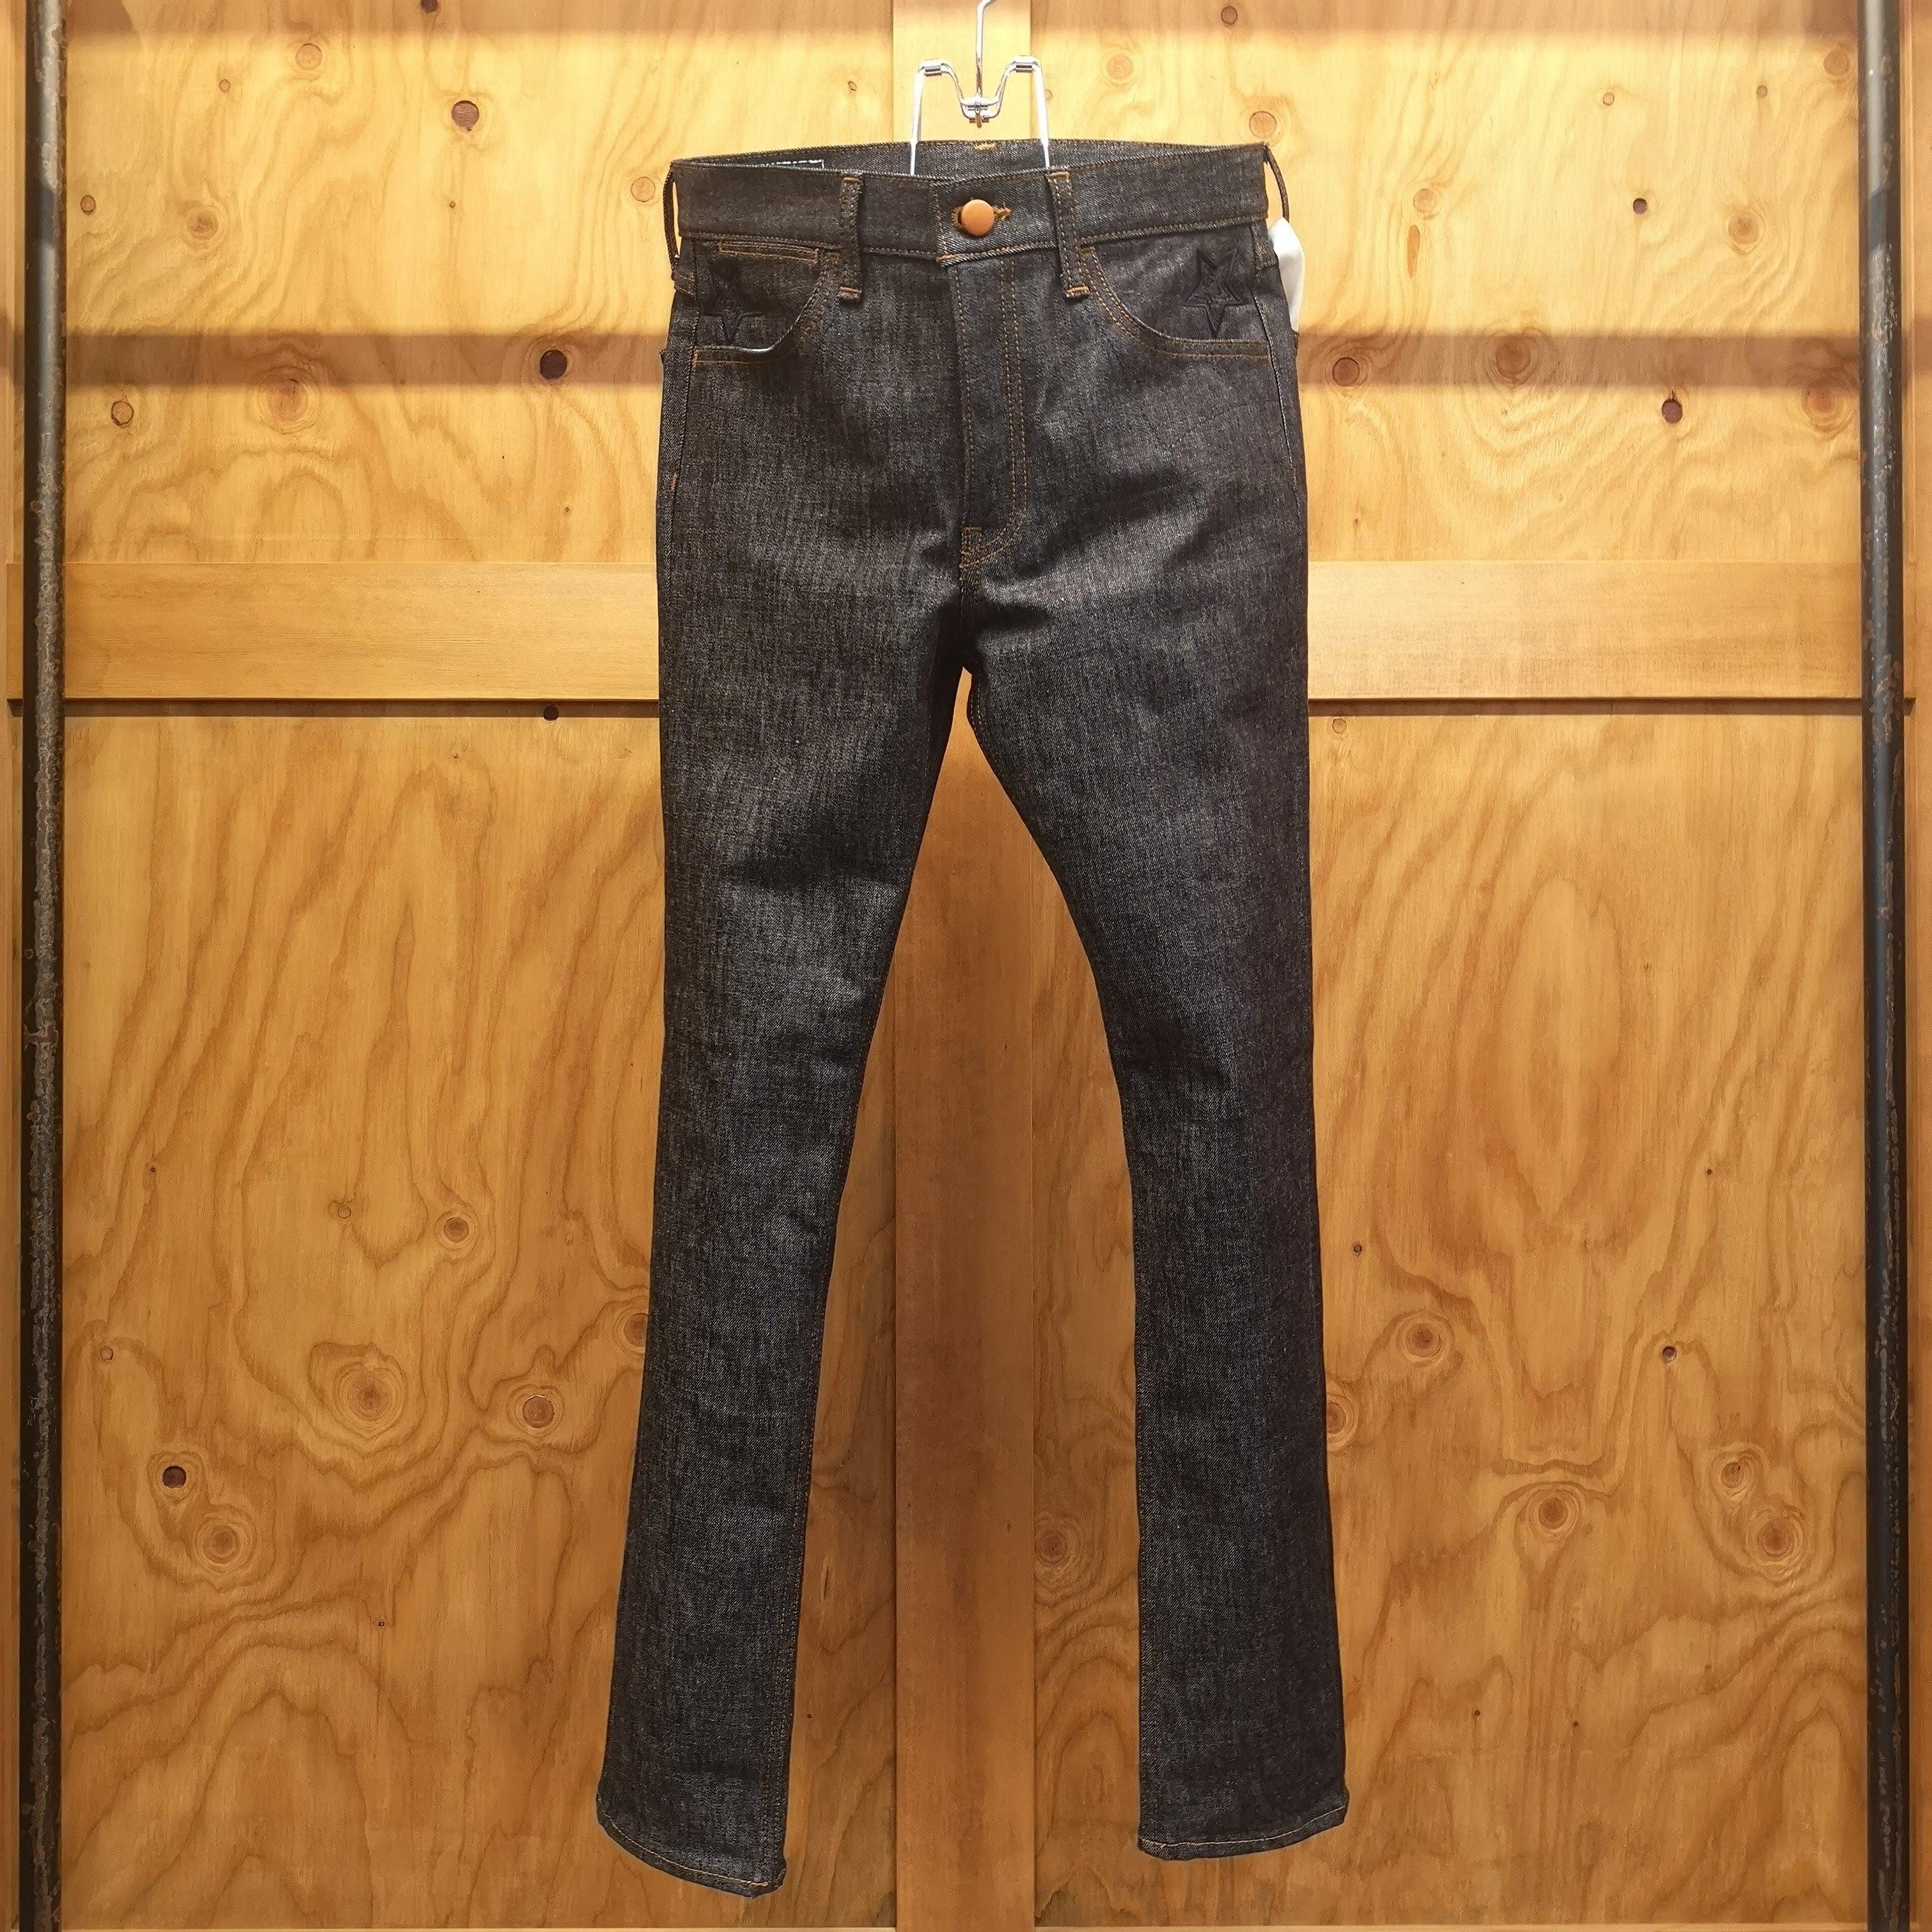 sd.0003AW18 : lone star basic skinny jean.